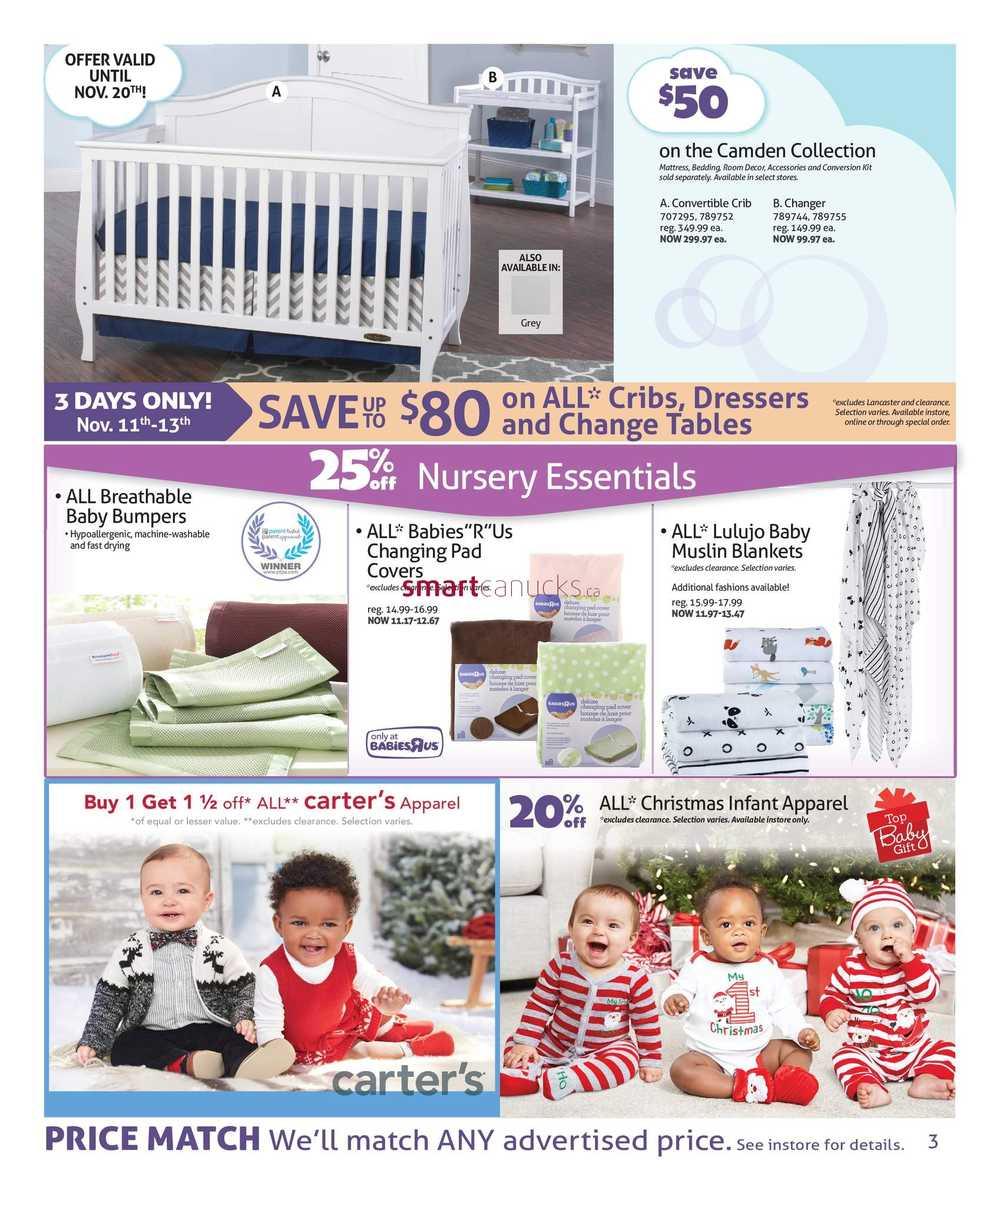 Toys r us coupons 2018 november